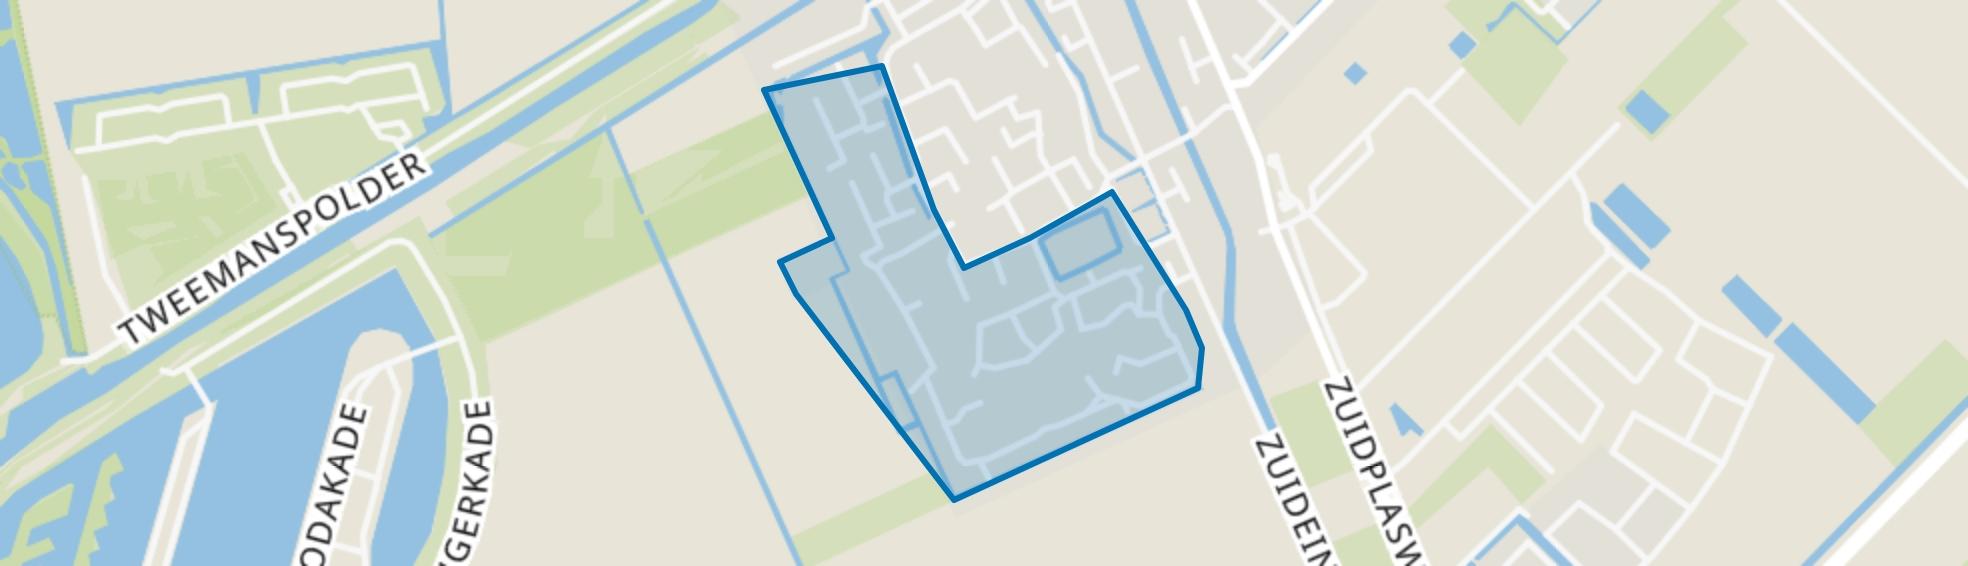 Zevenhuizen-West 2, Zevenhuizen (ZH) map